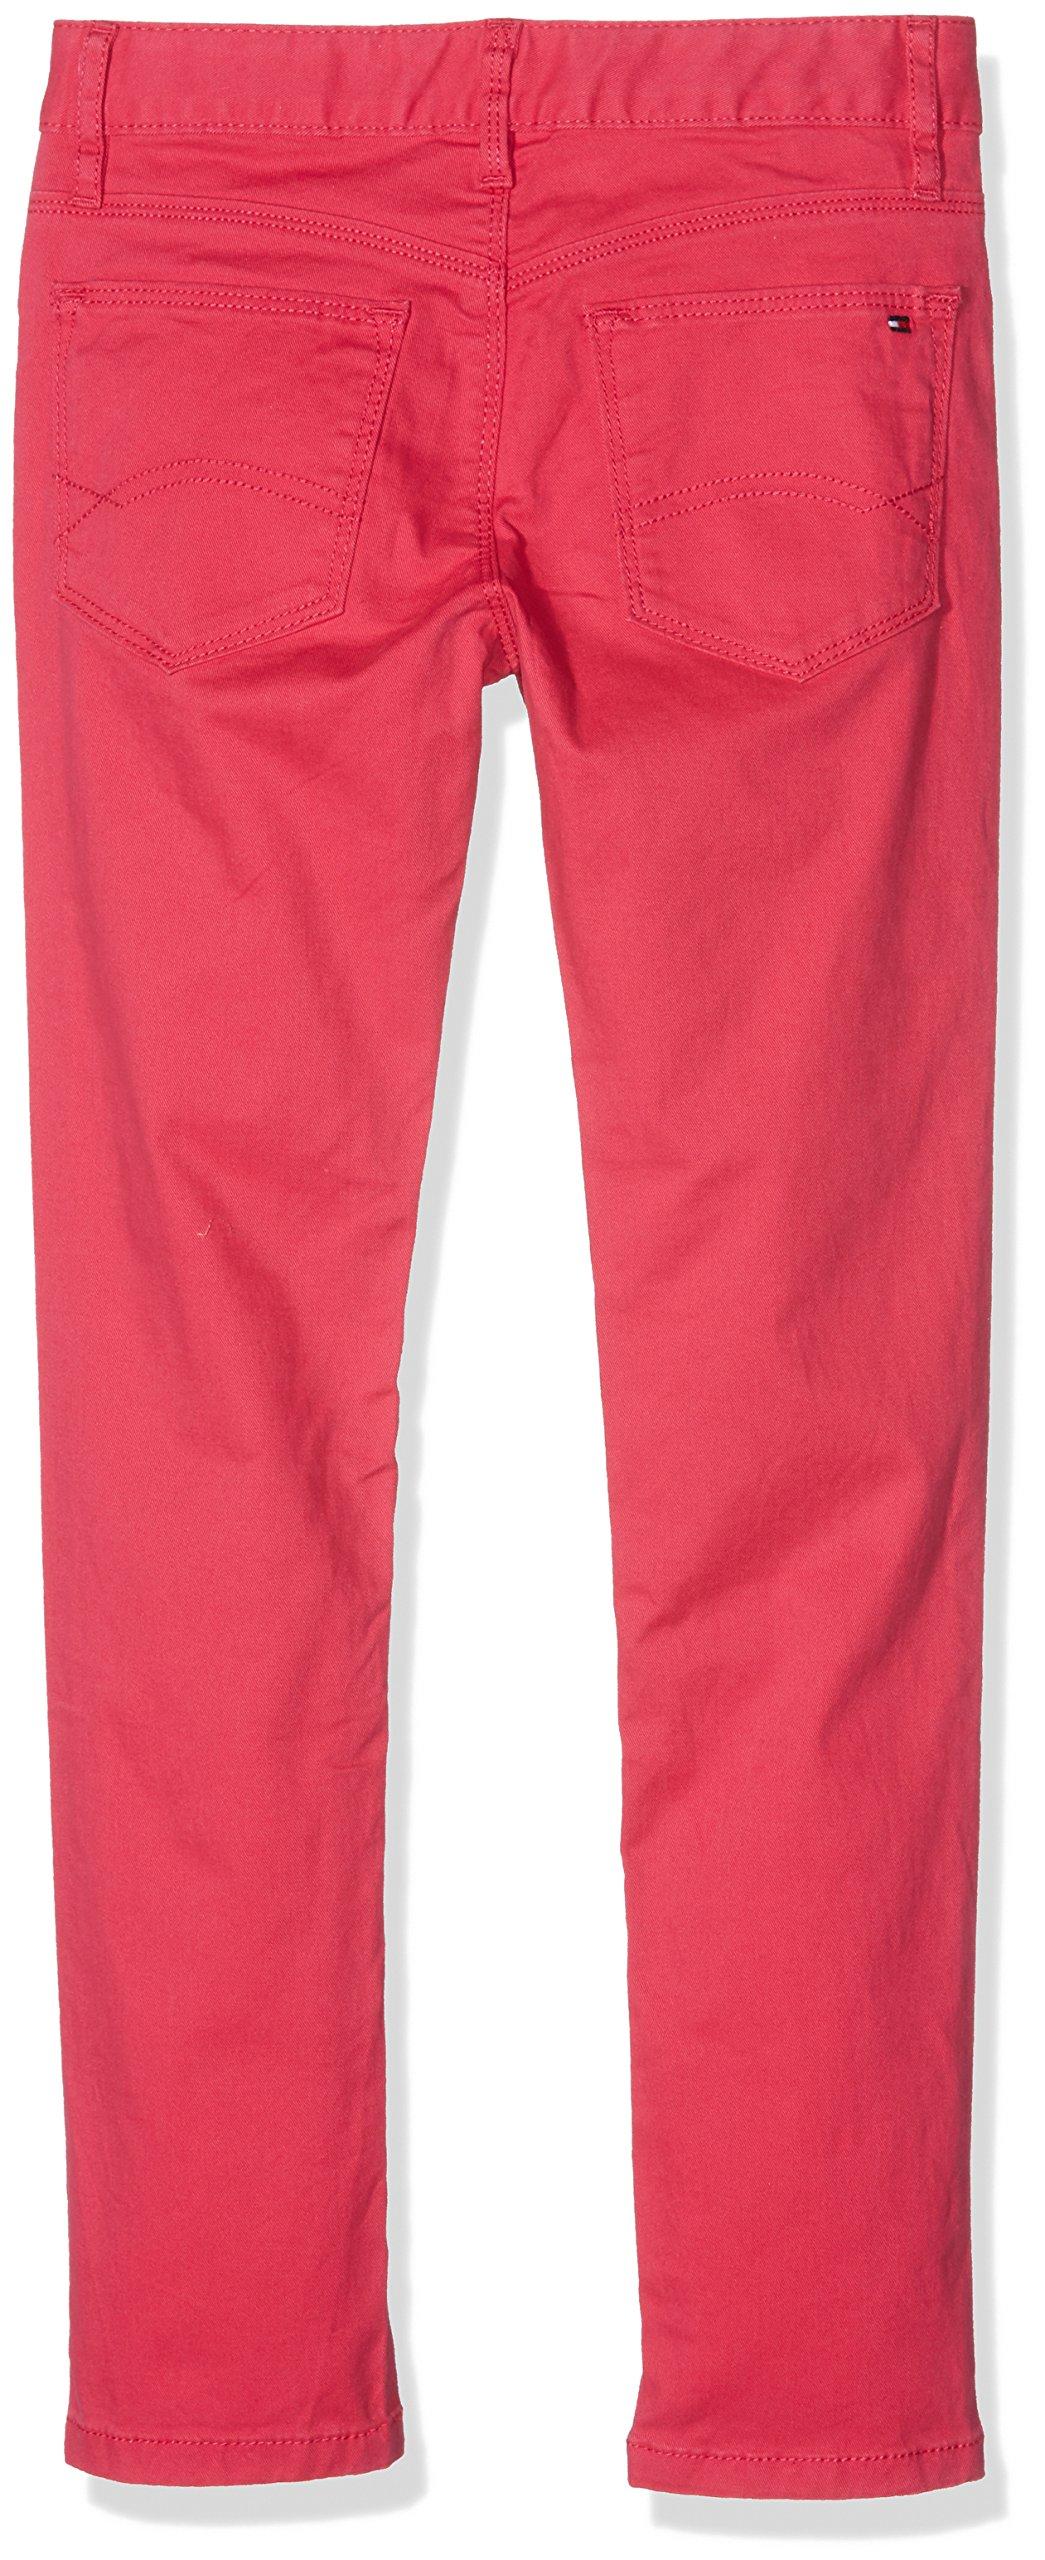 Tommy Hilfiger Ame Nora RR Skinny Fst Pantalones para Niños